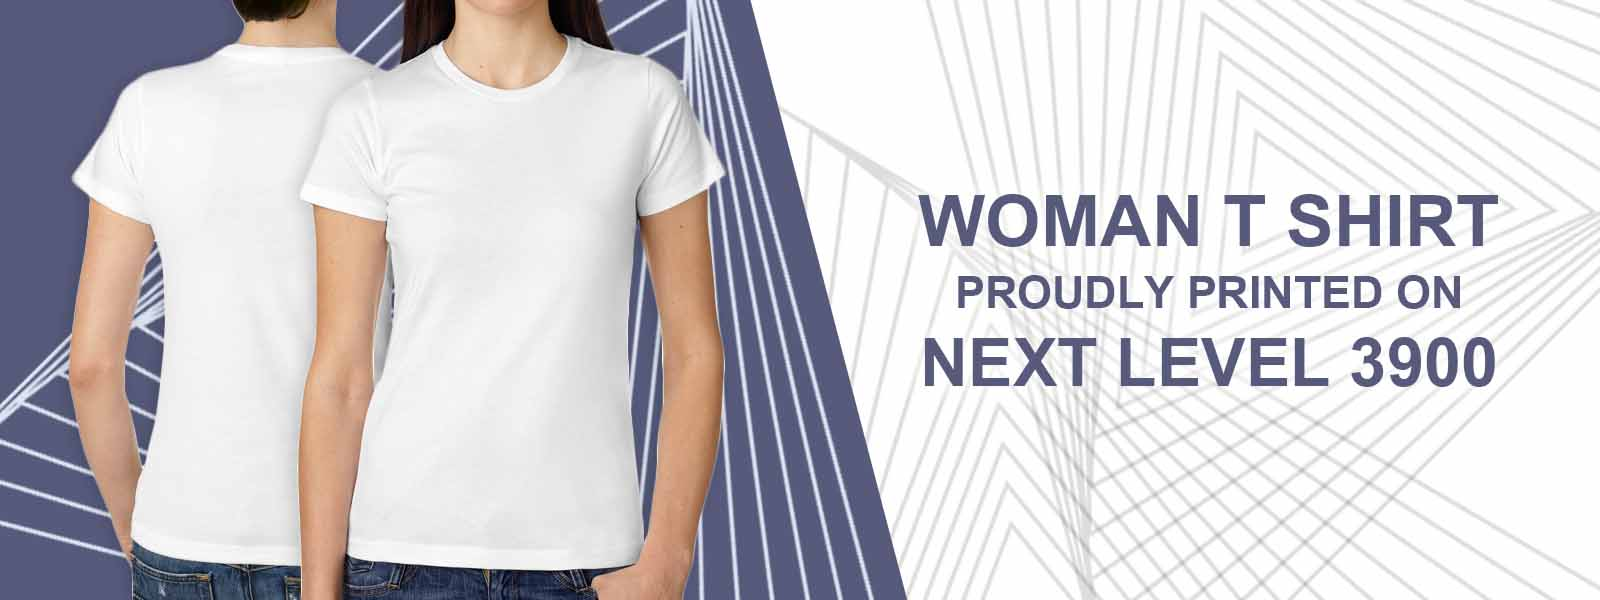 teespedia-banner-women-shirt-category.jpg